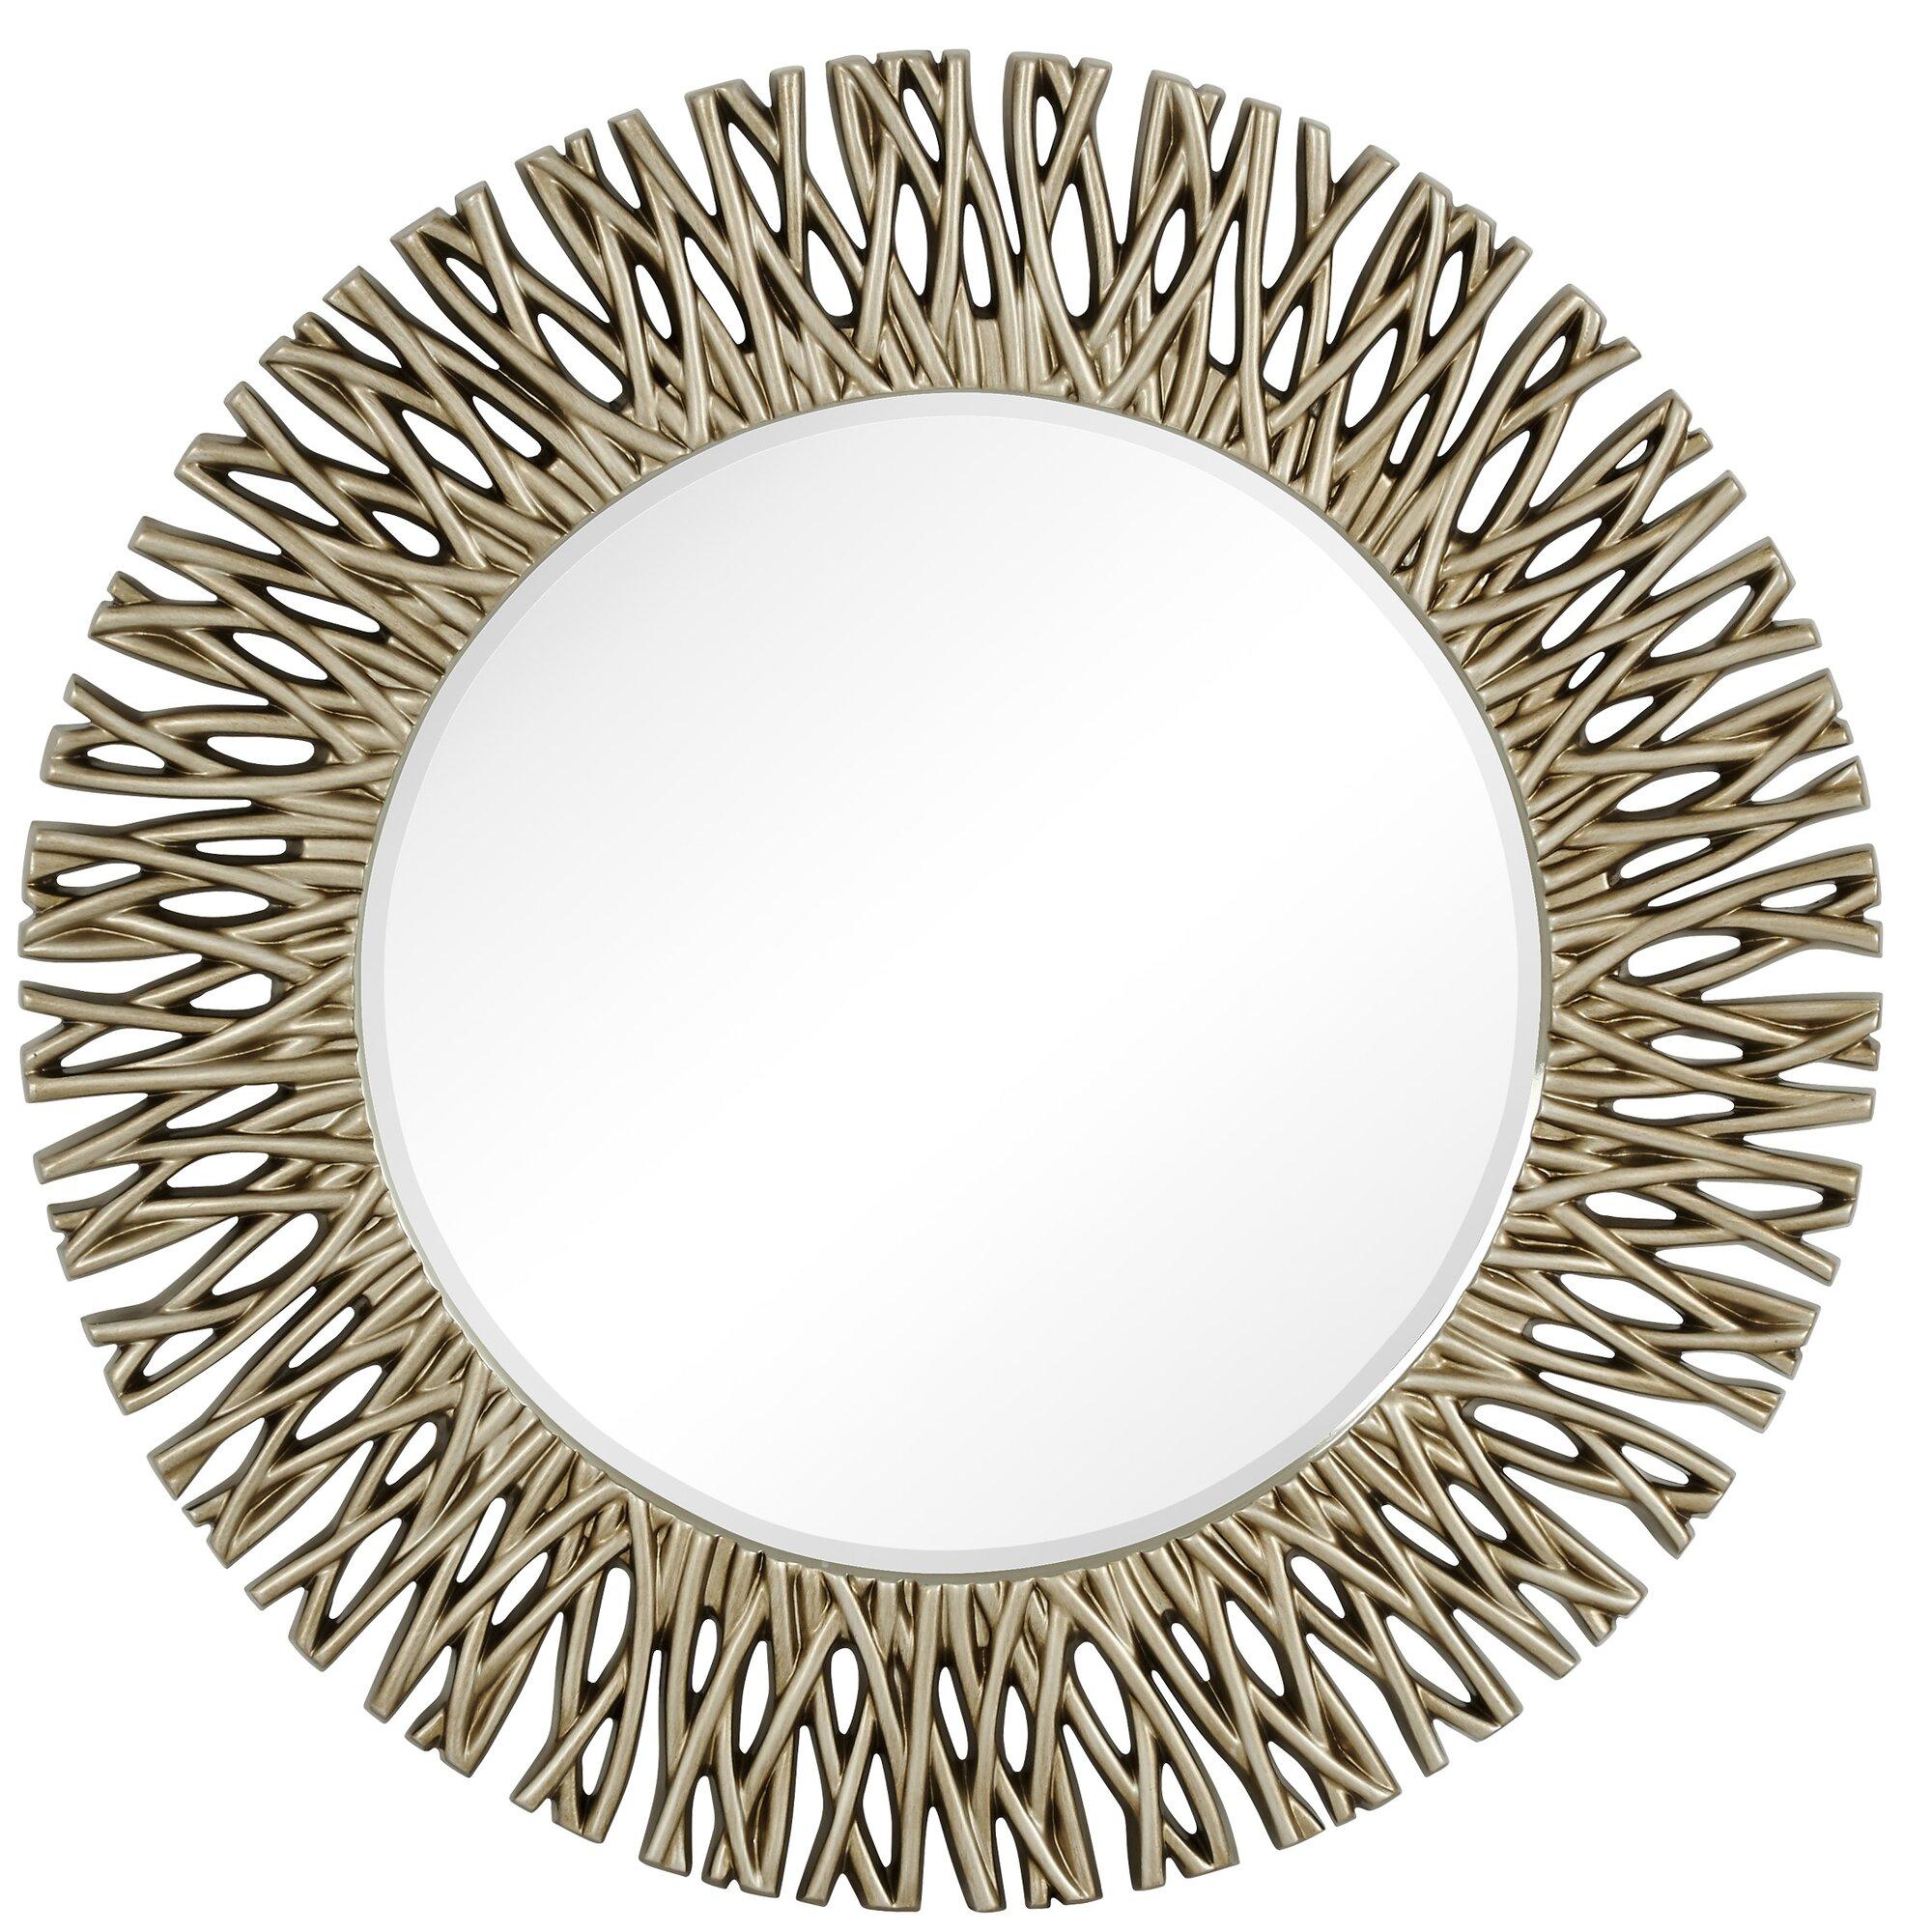 large round antique silver decorative beveled glass wall mirror - Large Decorative Wall Mirrors